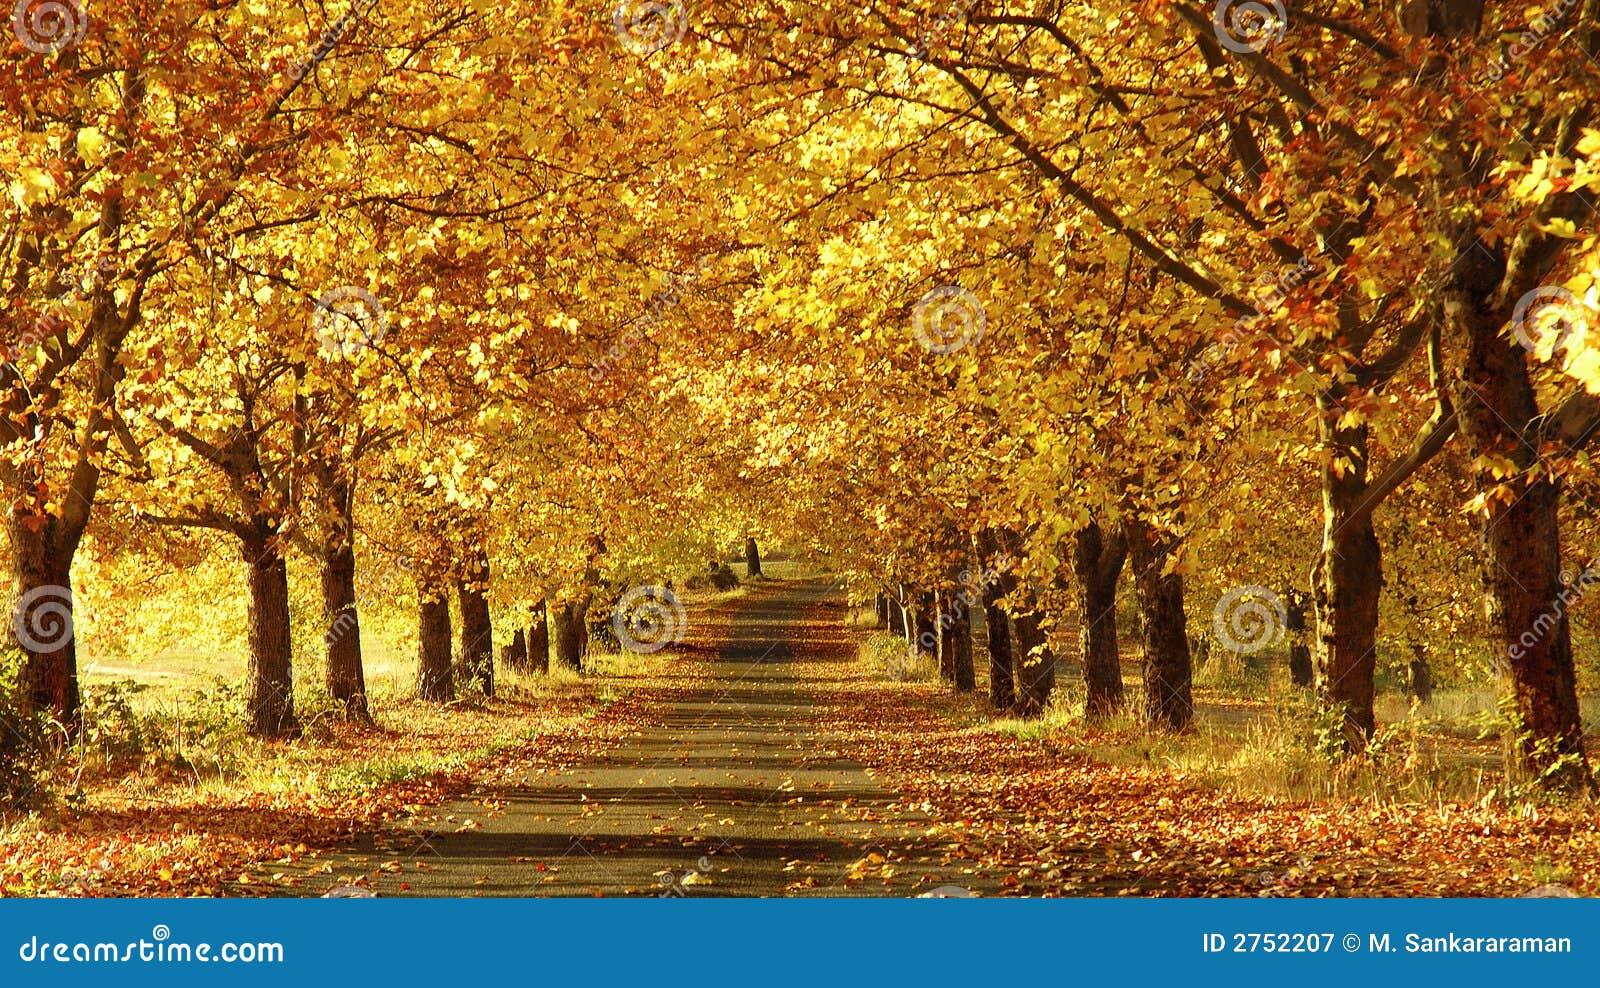 Upadek   the pathway